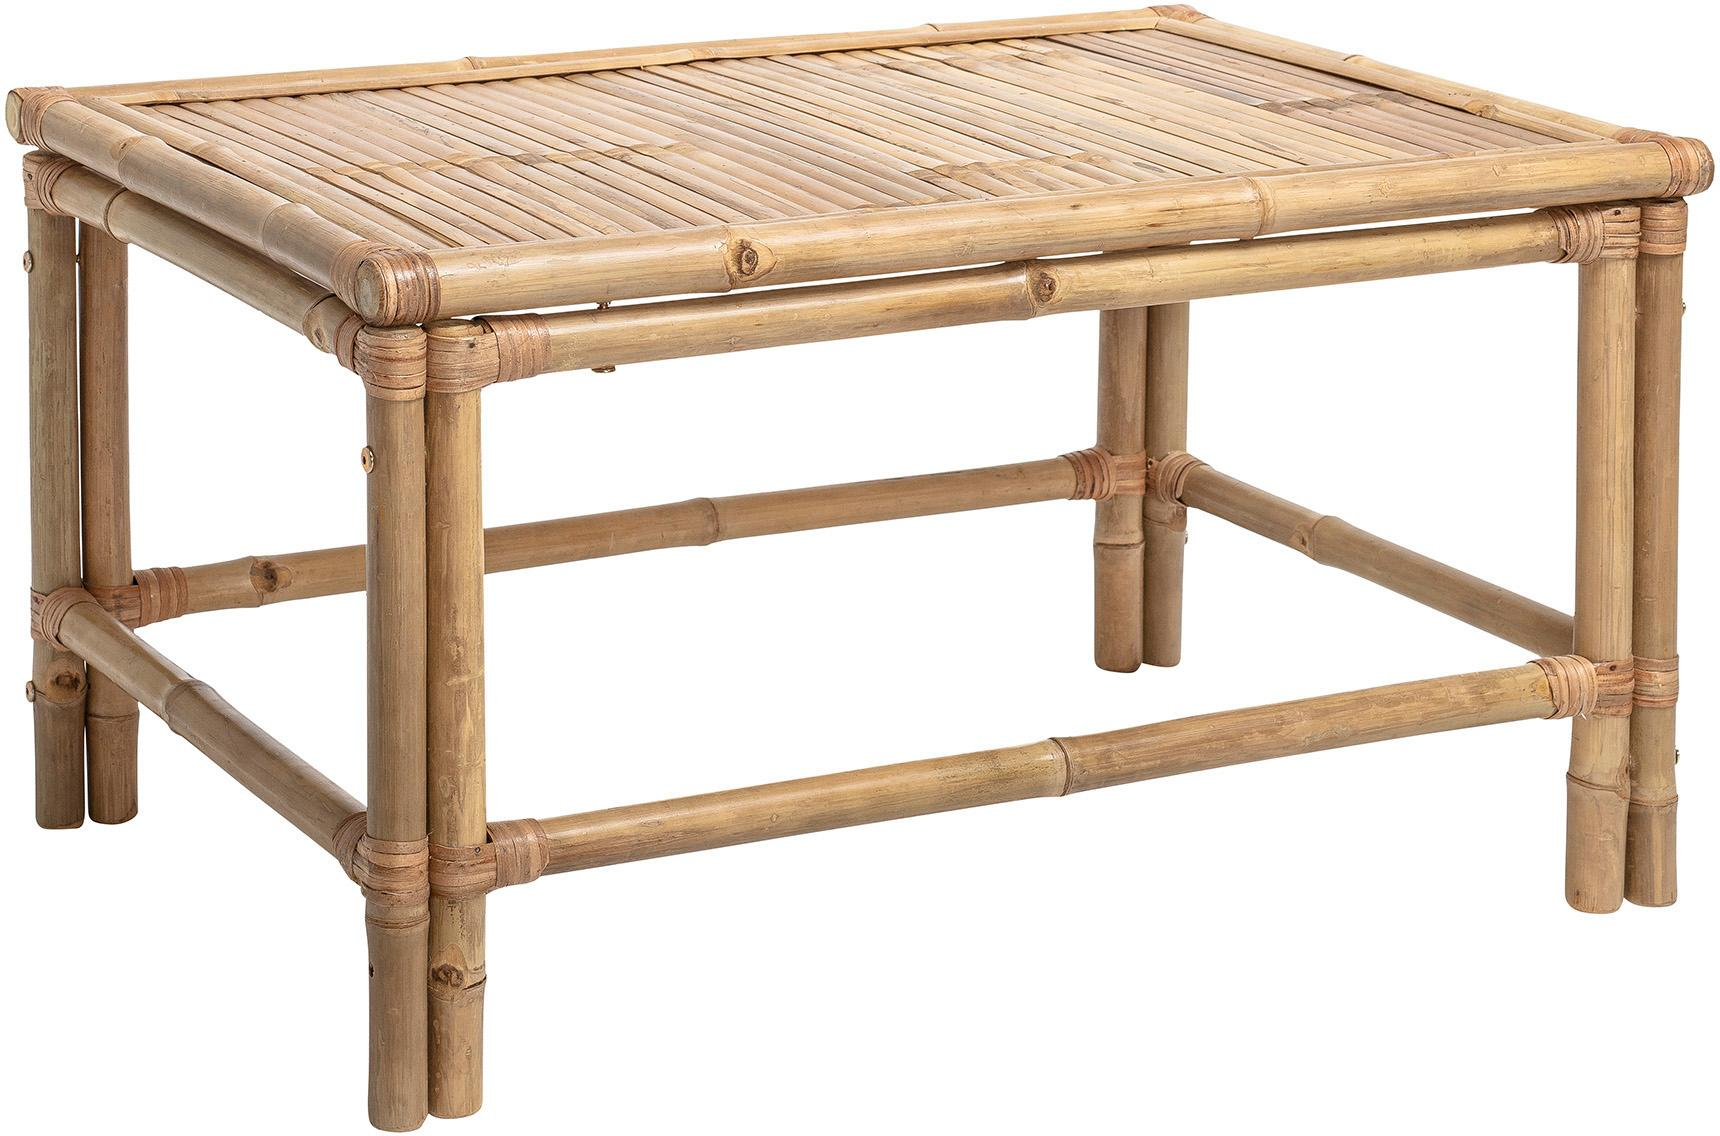 Tavolino da salotto in bambù Sole, Bambù, Beige, Larg. 90 x Prof. 60 cm